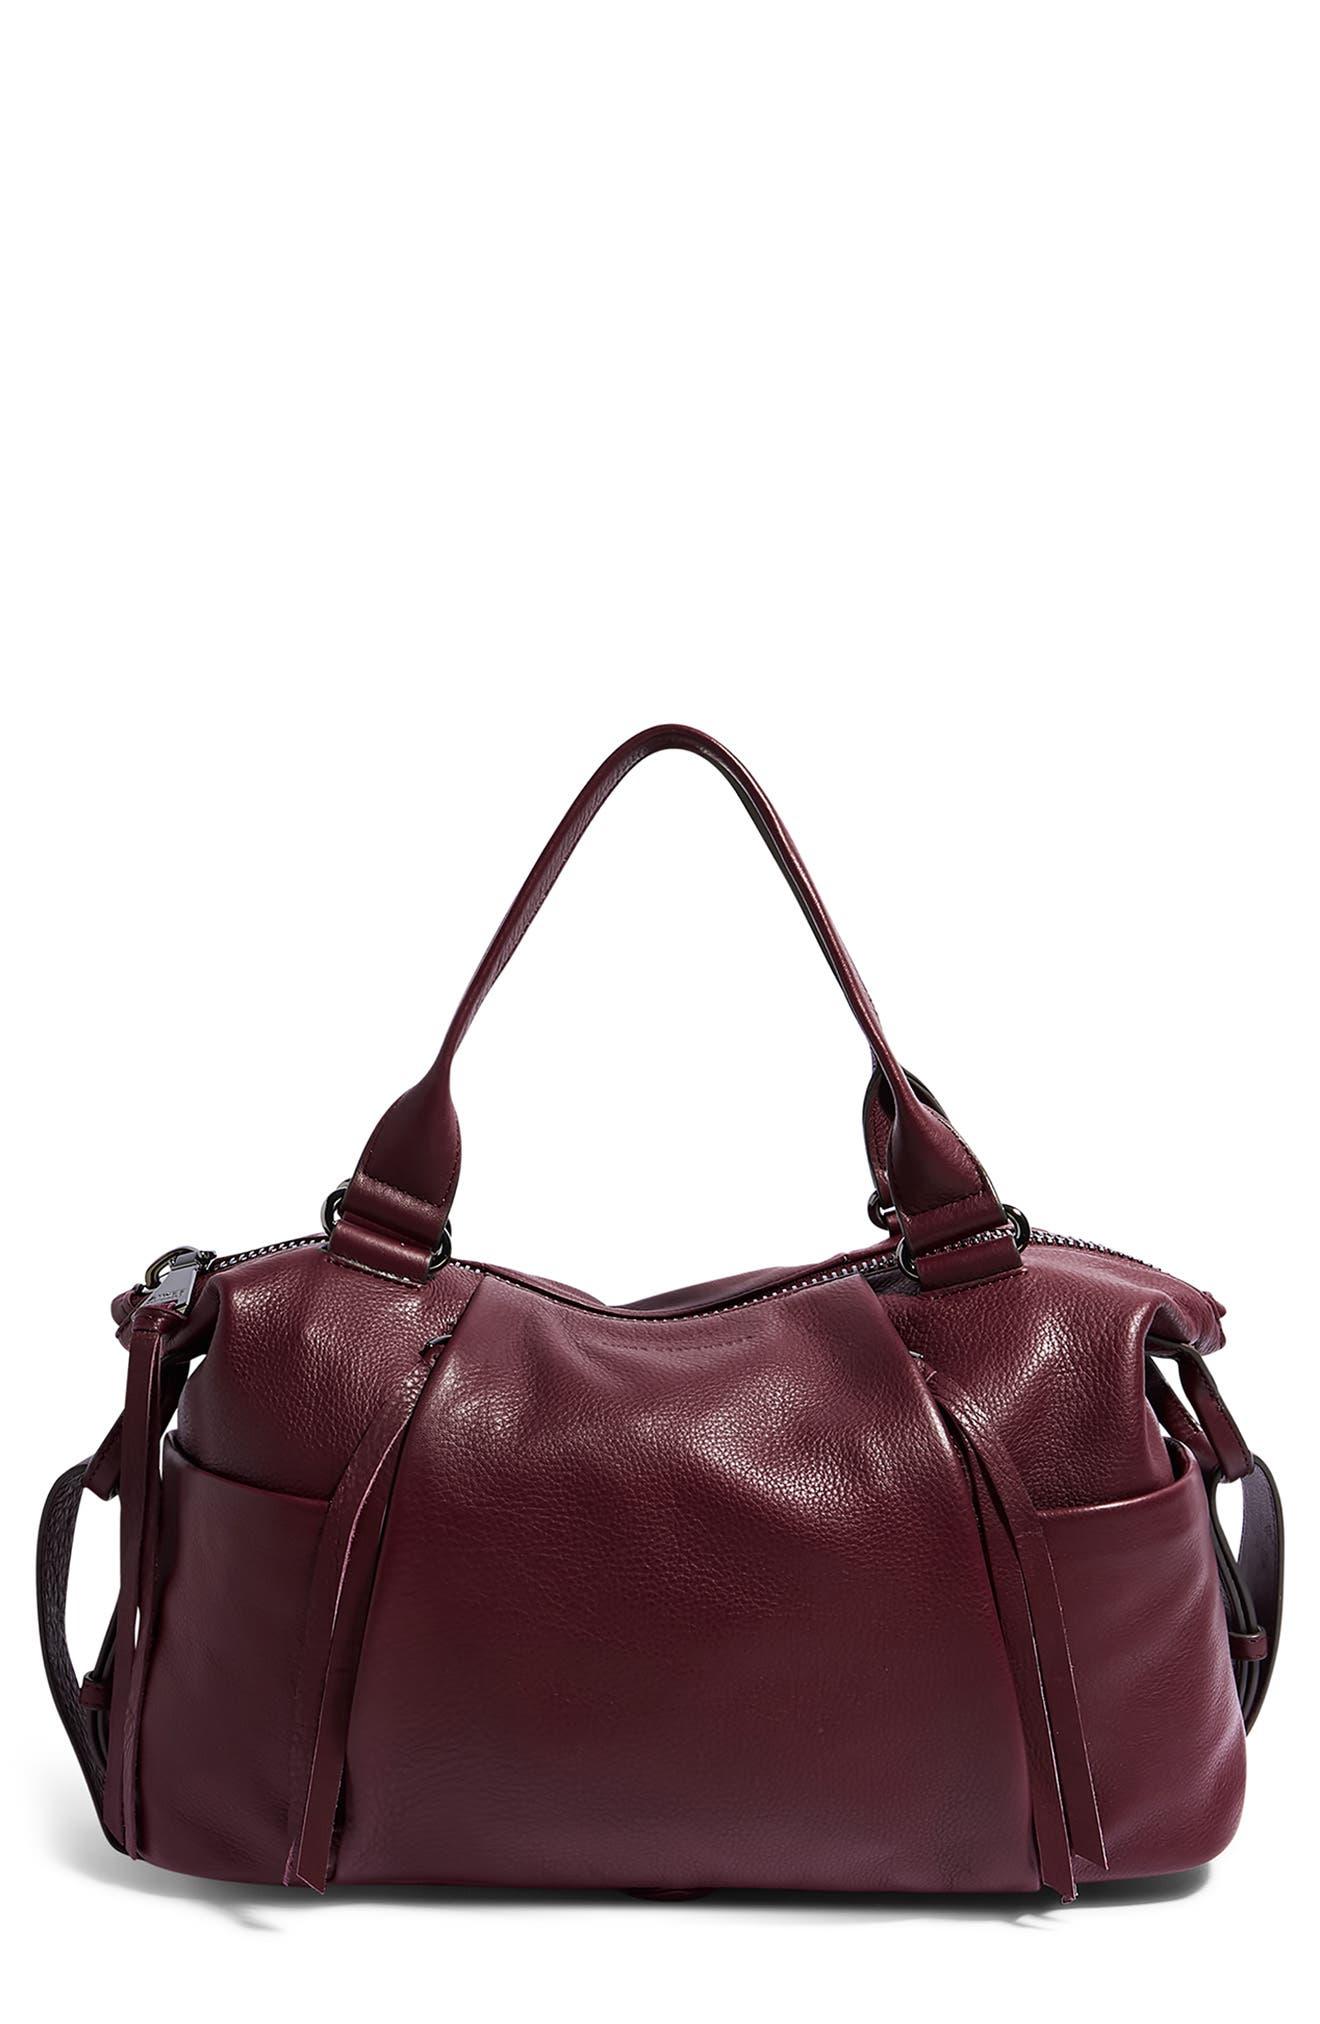 Tamitha Leather Satchel